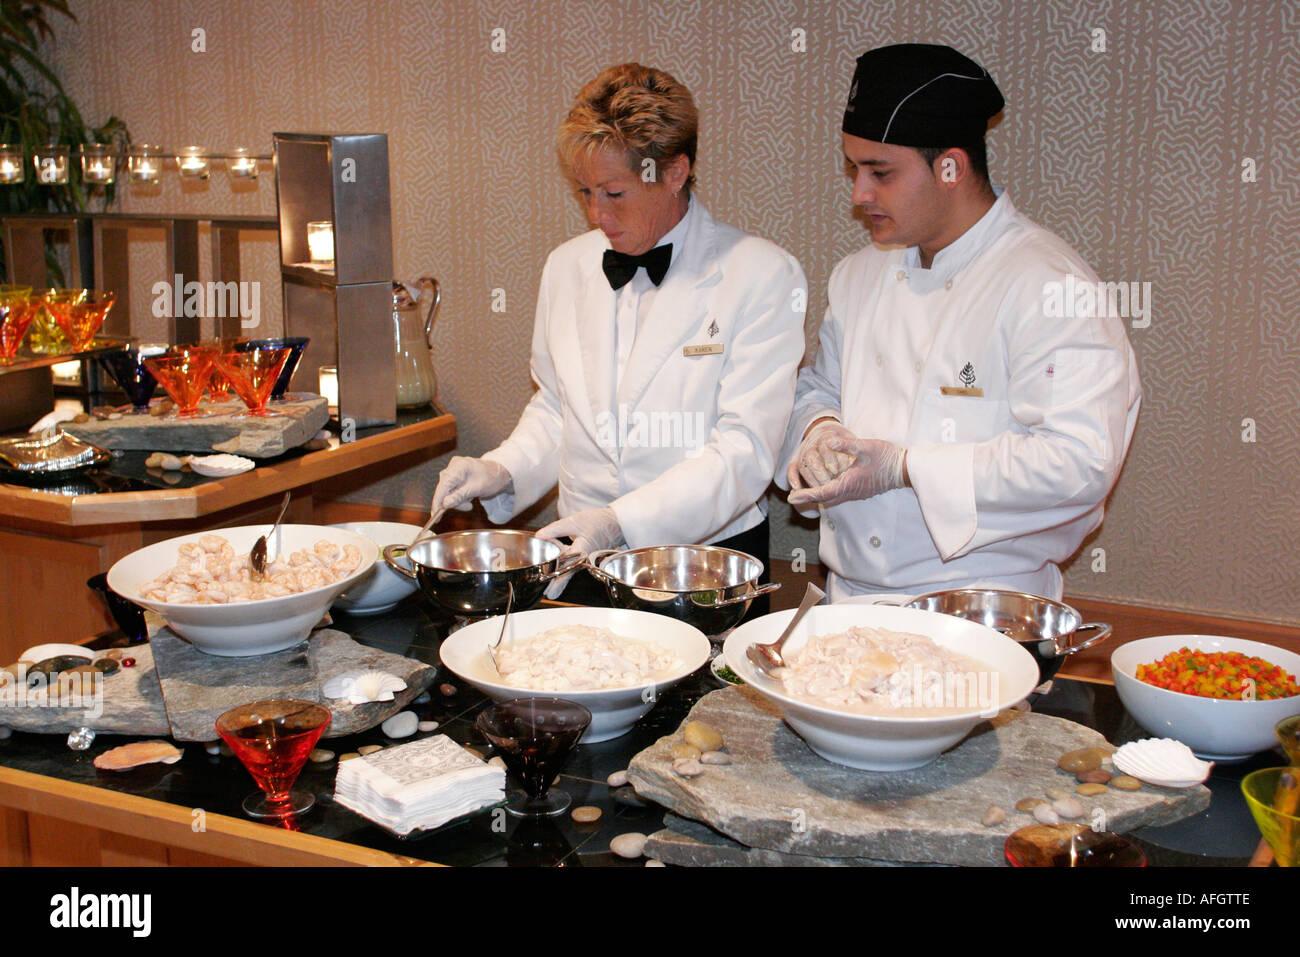 miami florida brickell avenue four seasons hotel cook server miami florida brickell avenue four seasons hotel cook server buffet food